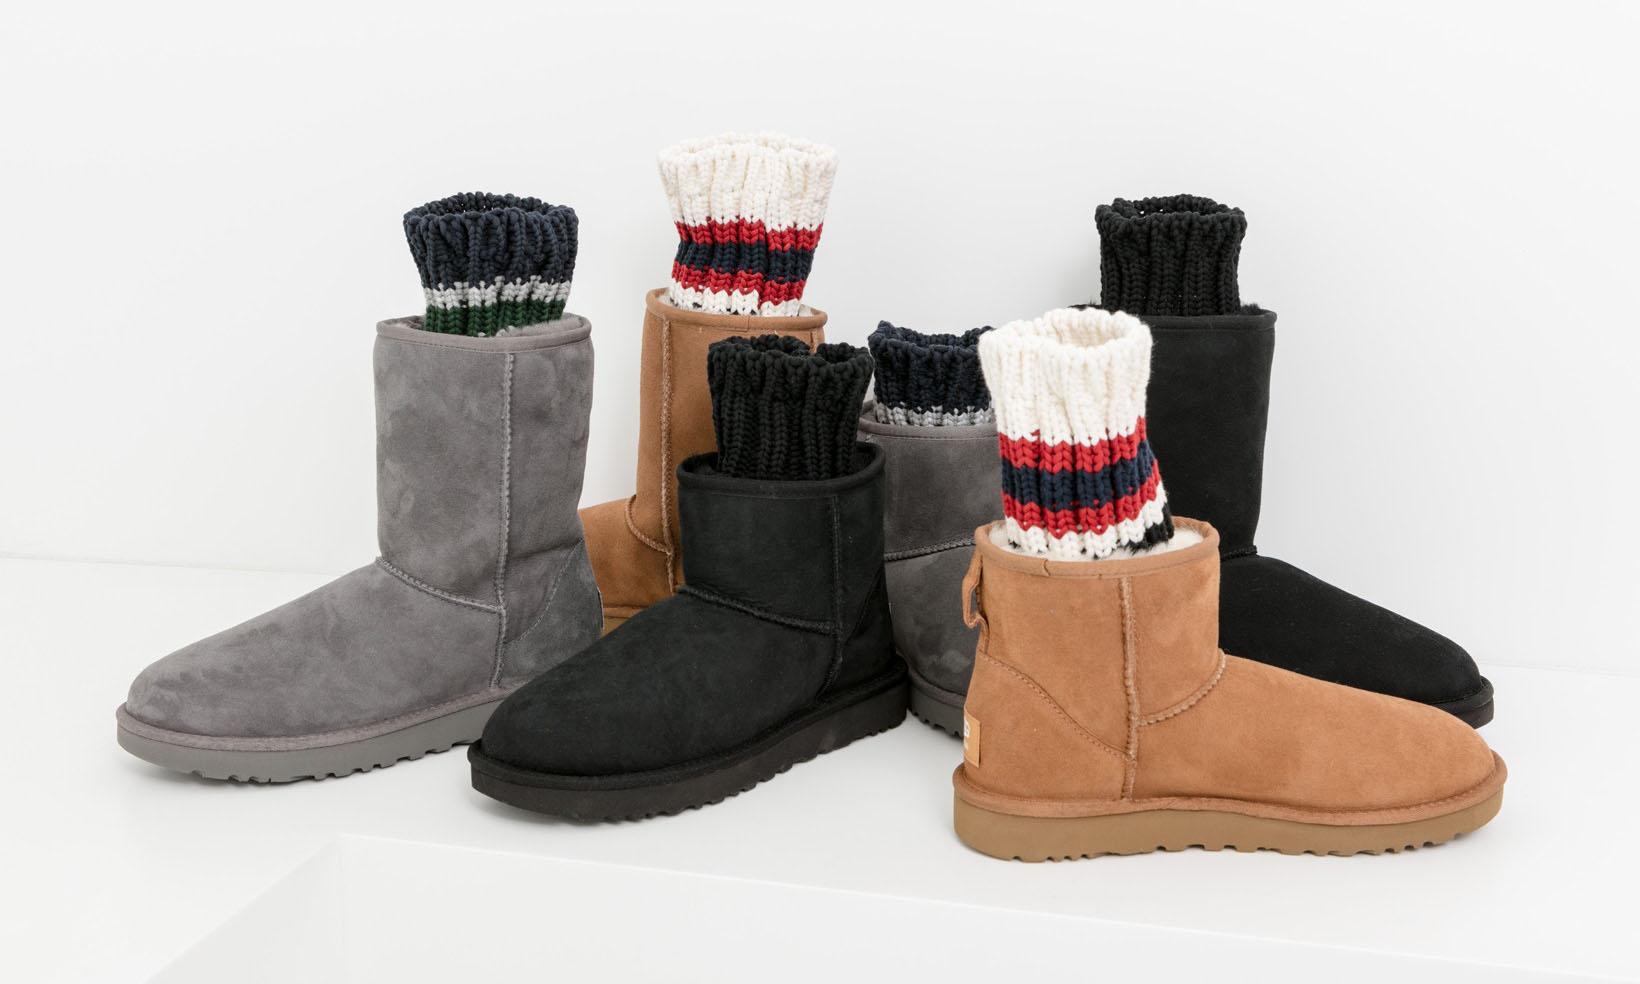 sacai 和 UGG 联手打造 2018 秋冬鞋款